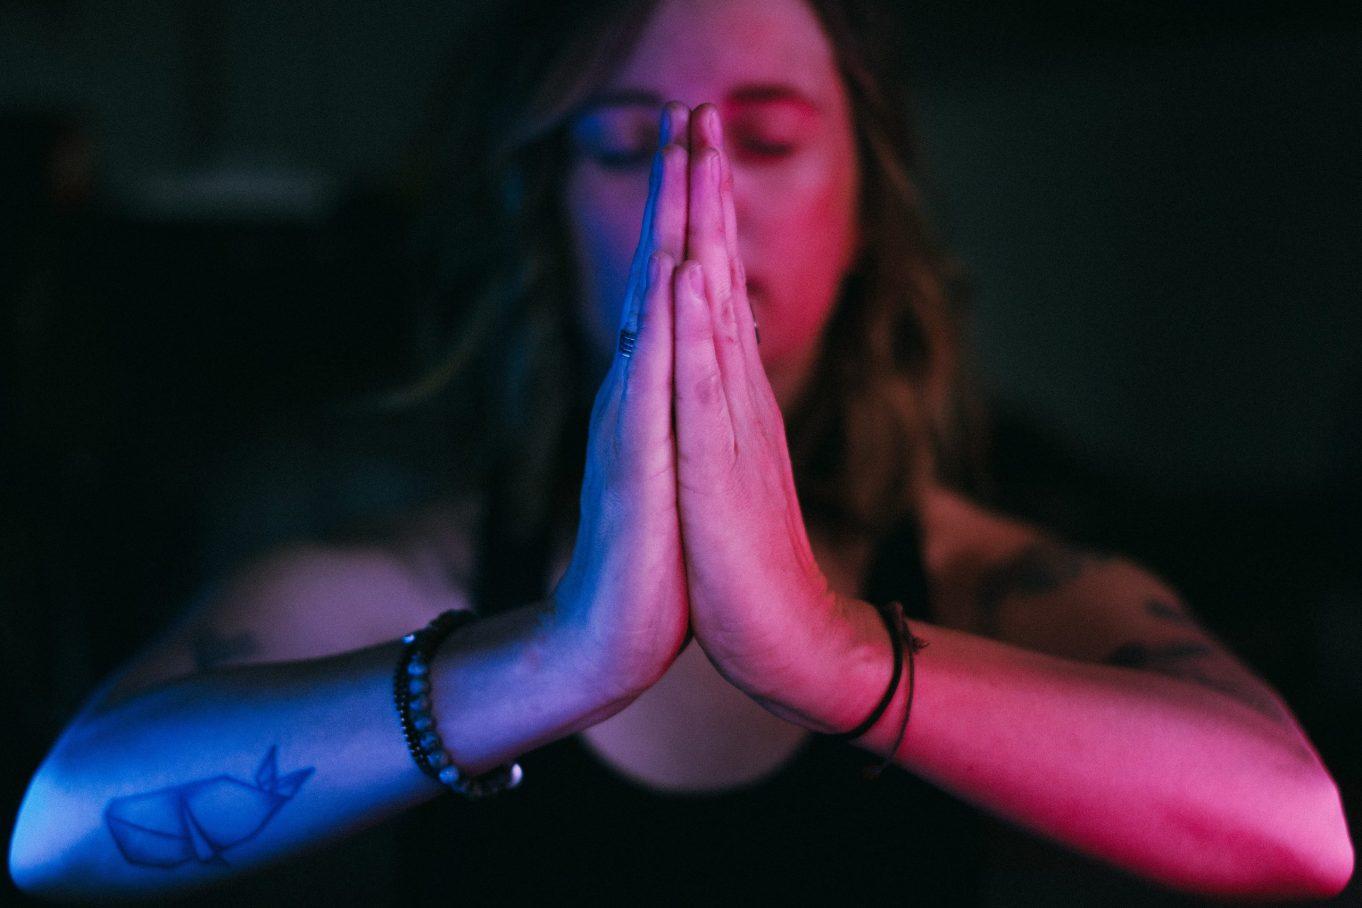 Frau Namaste Hände